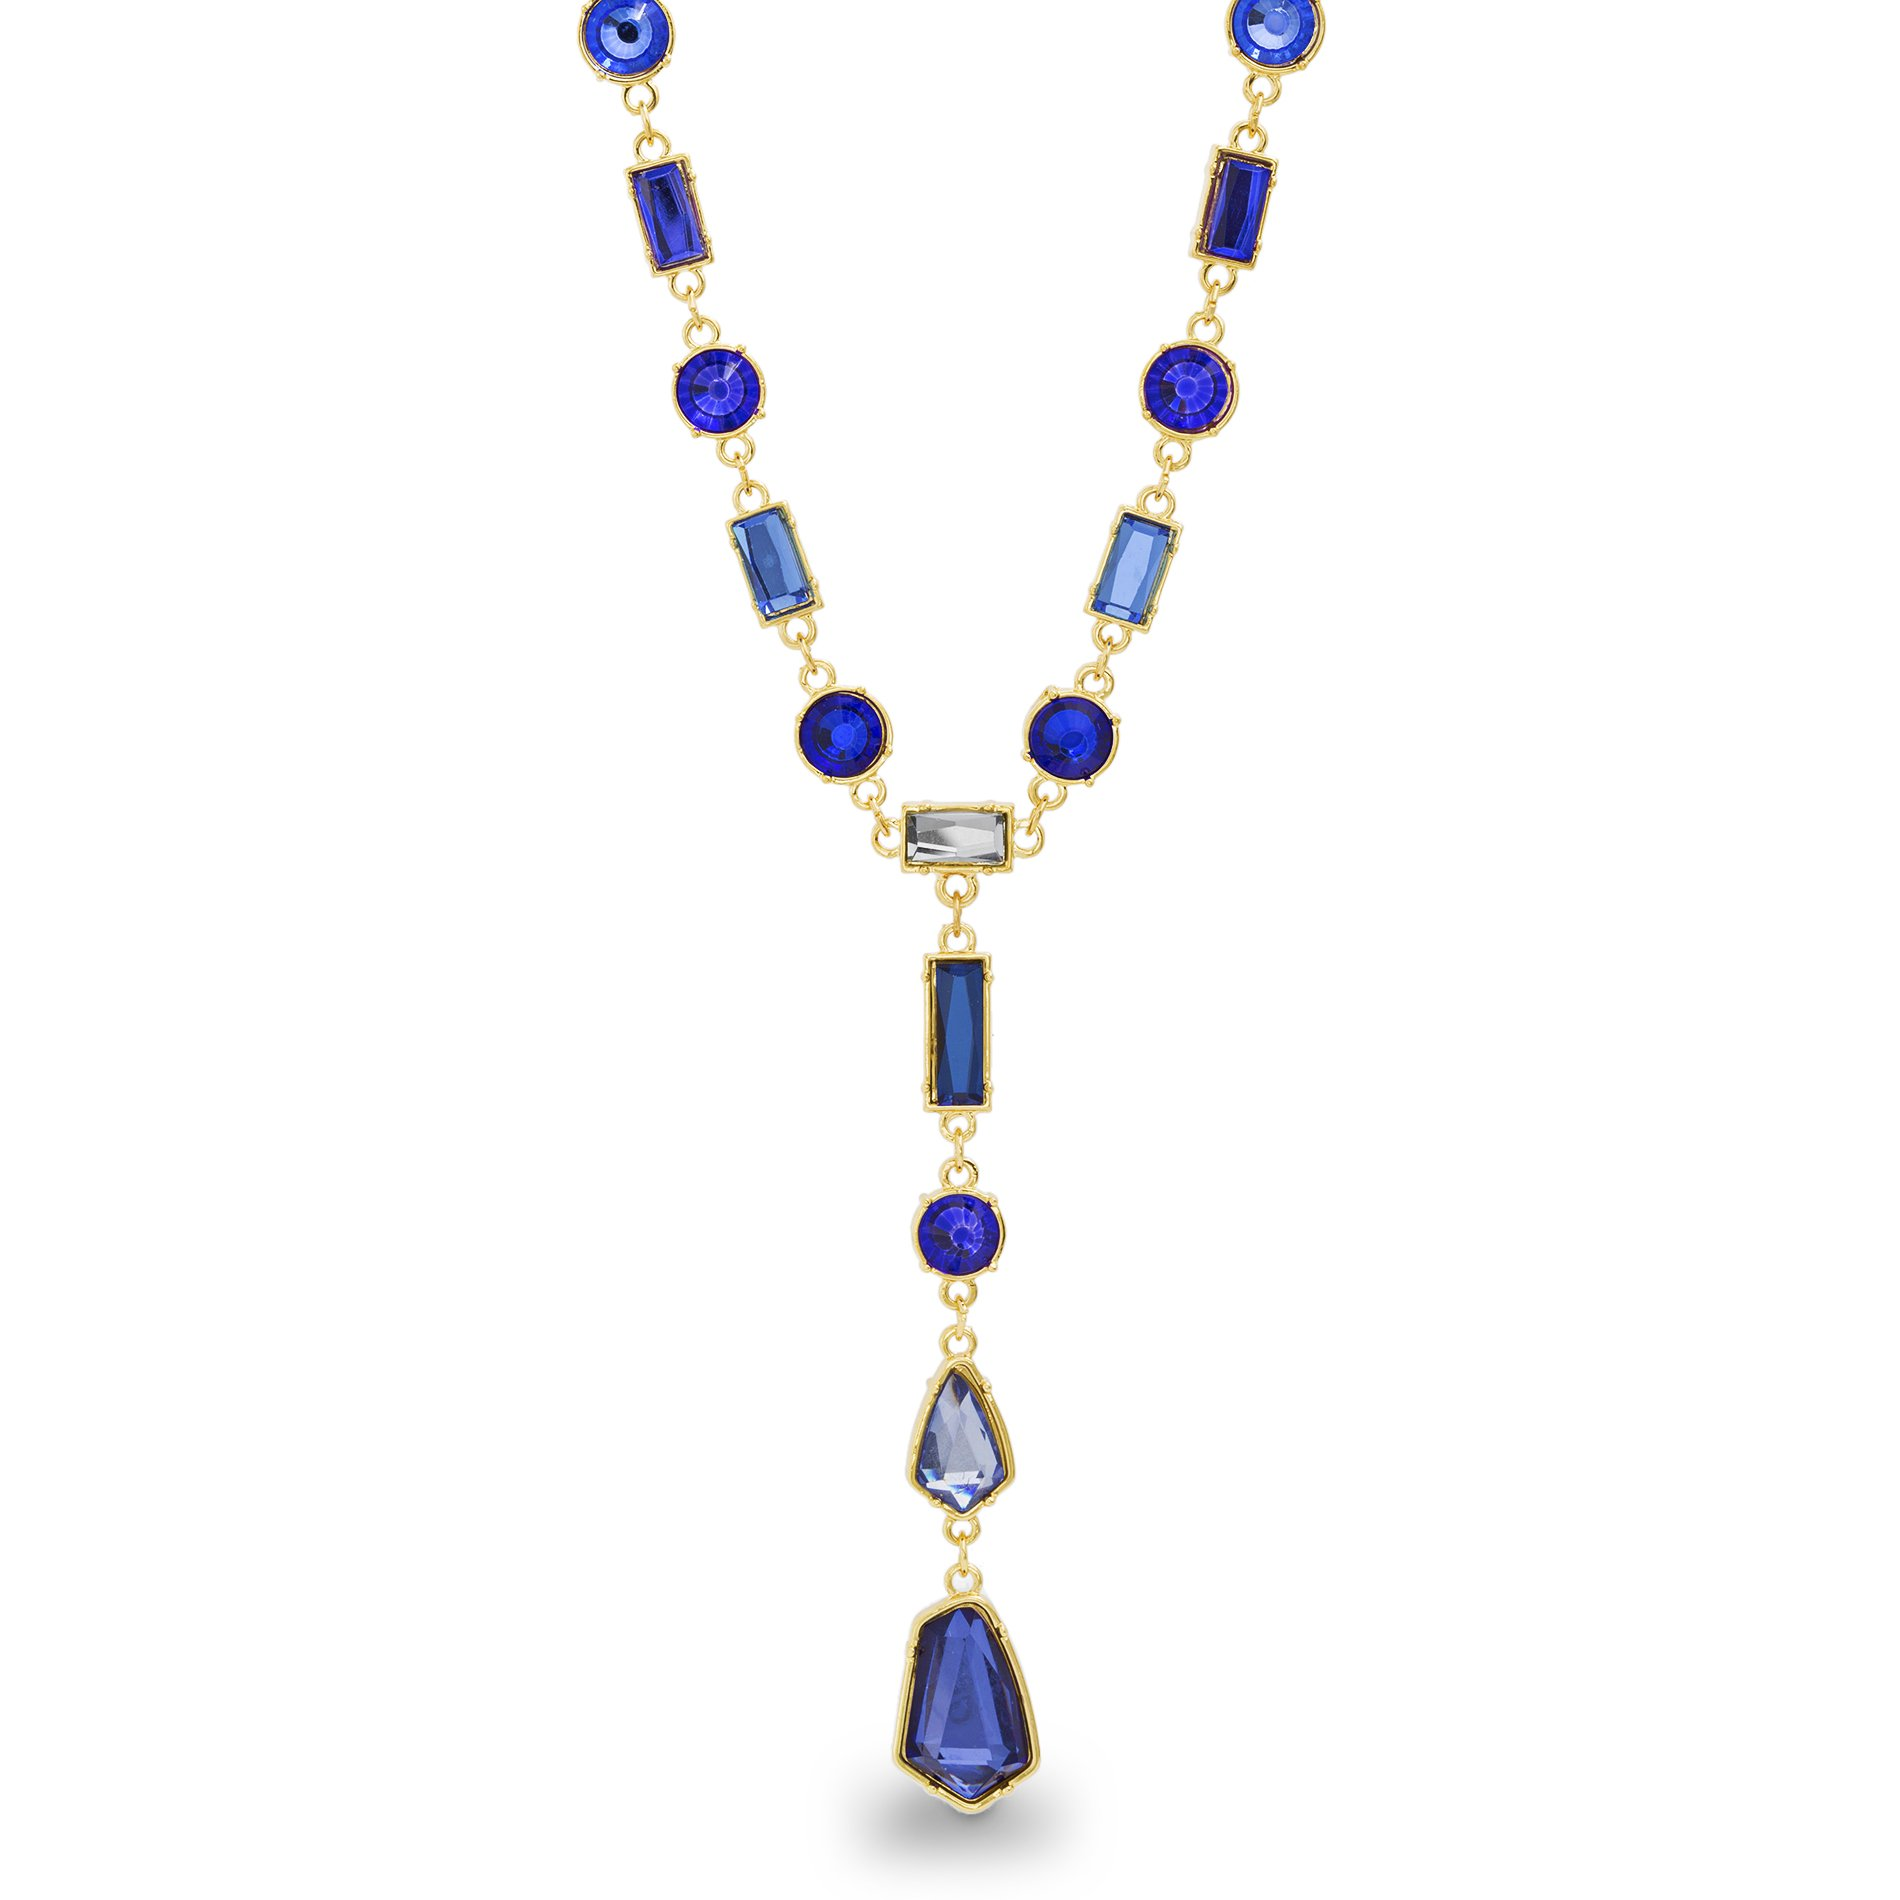 Catherine Malandrino Women's Blue Multi-Tonal Y-Style Yellow Gold-Tone Necklace